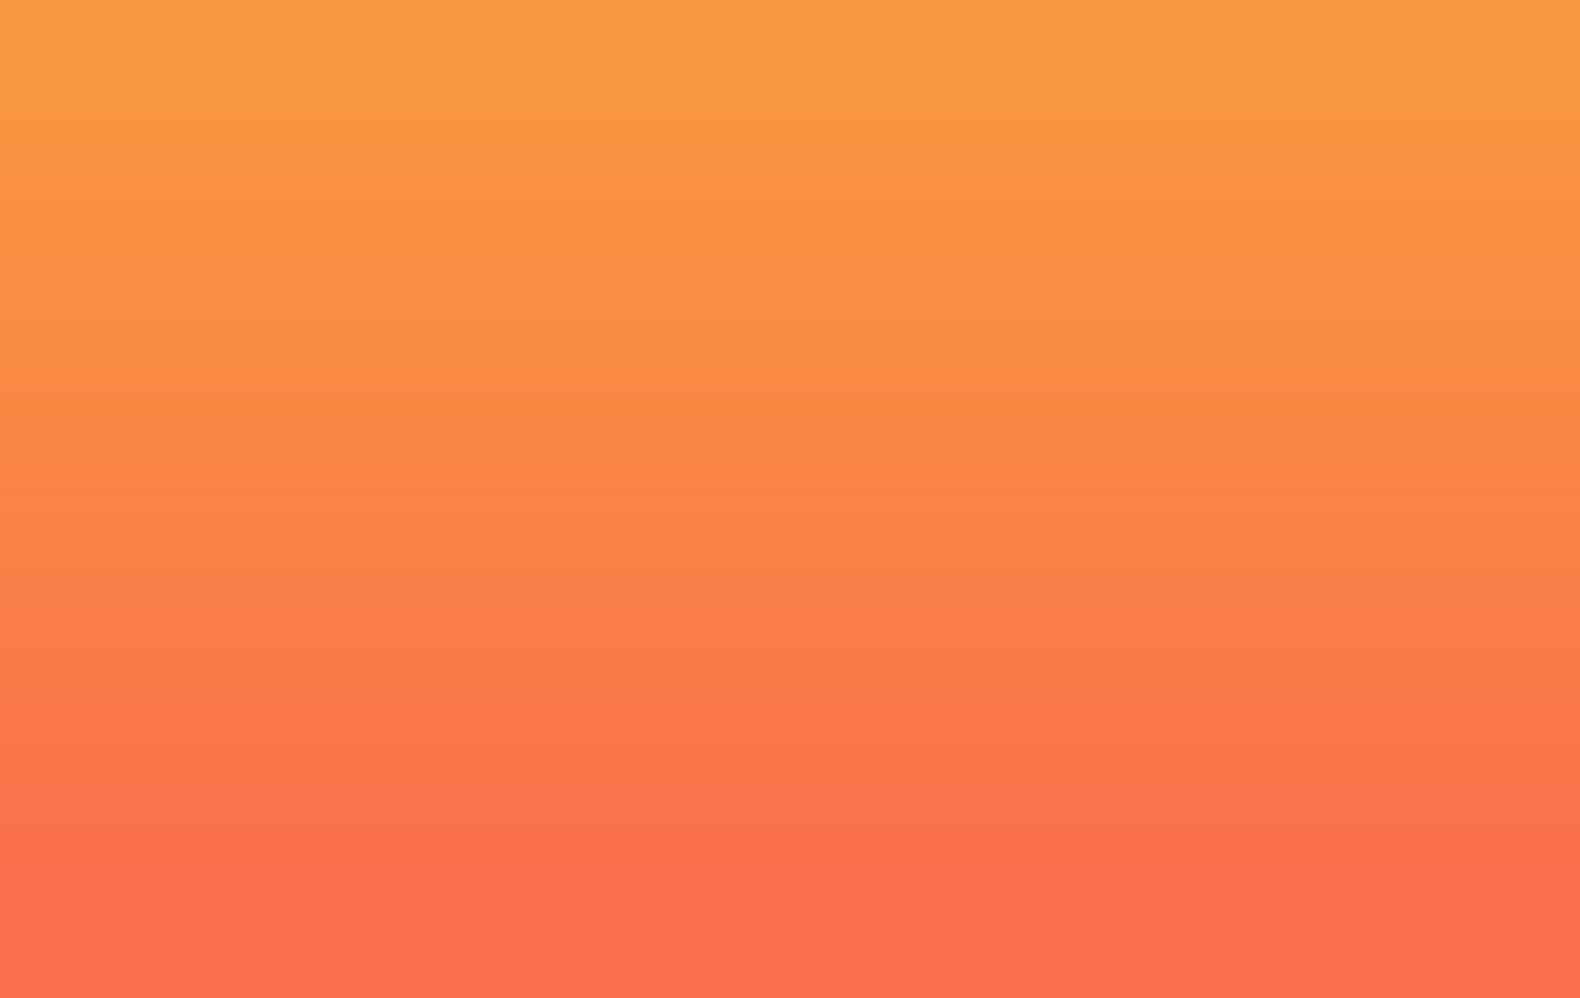 Sour Tropical Yellow Orange Gradient UI Background